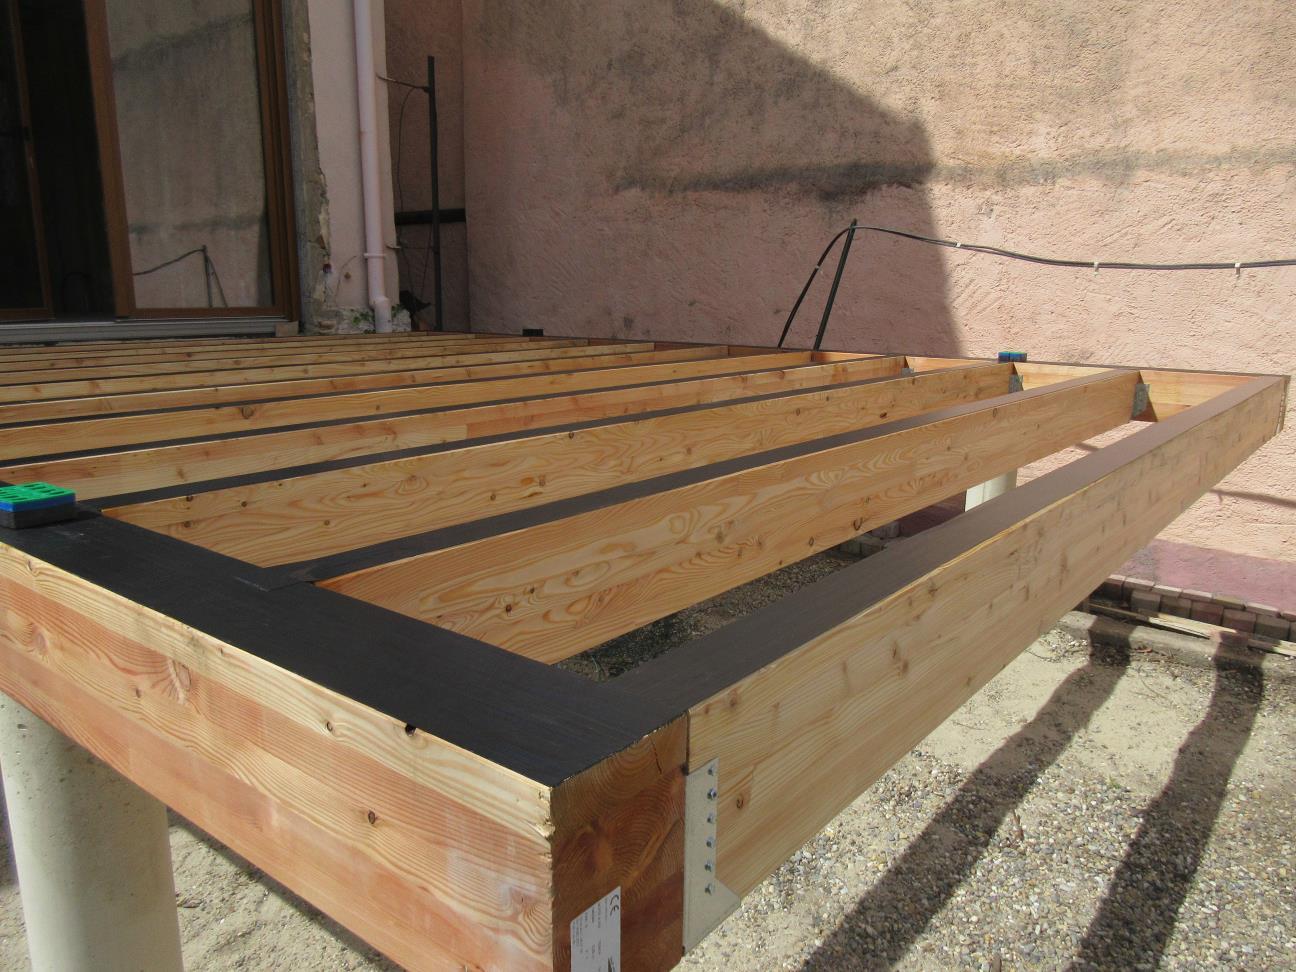 Poteau Bois Pour Terrasse terrasse en bois mélèze - lipsheim 67 - projet t2 - hemia